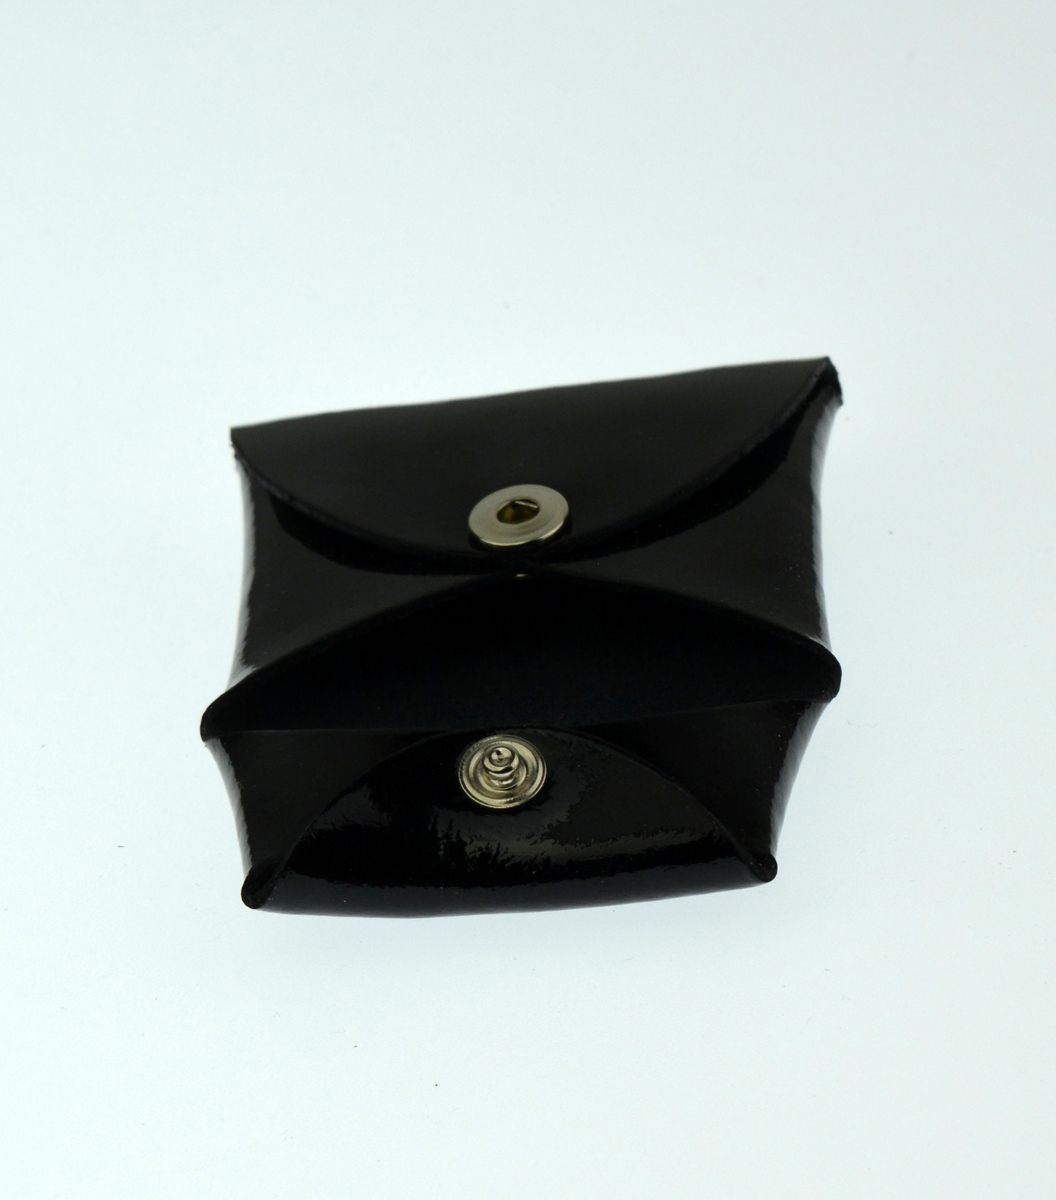 Kožený mincovník FACEBAG - Černá lak